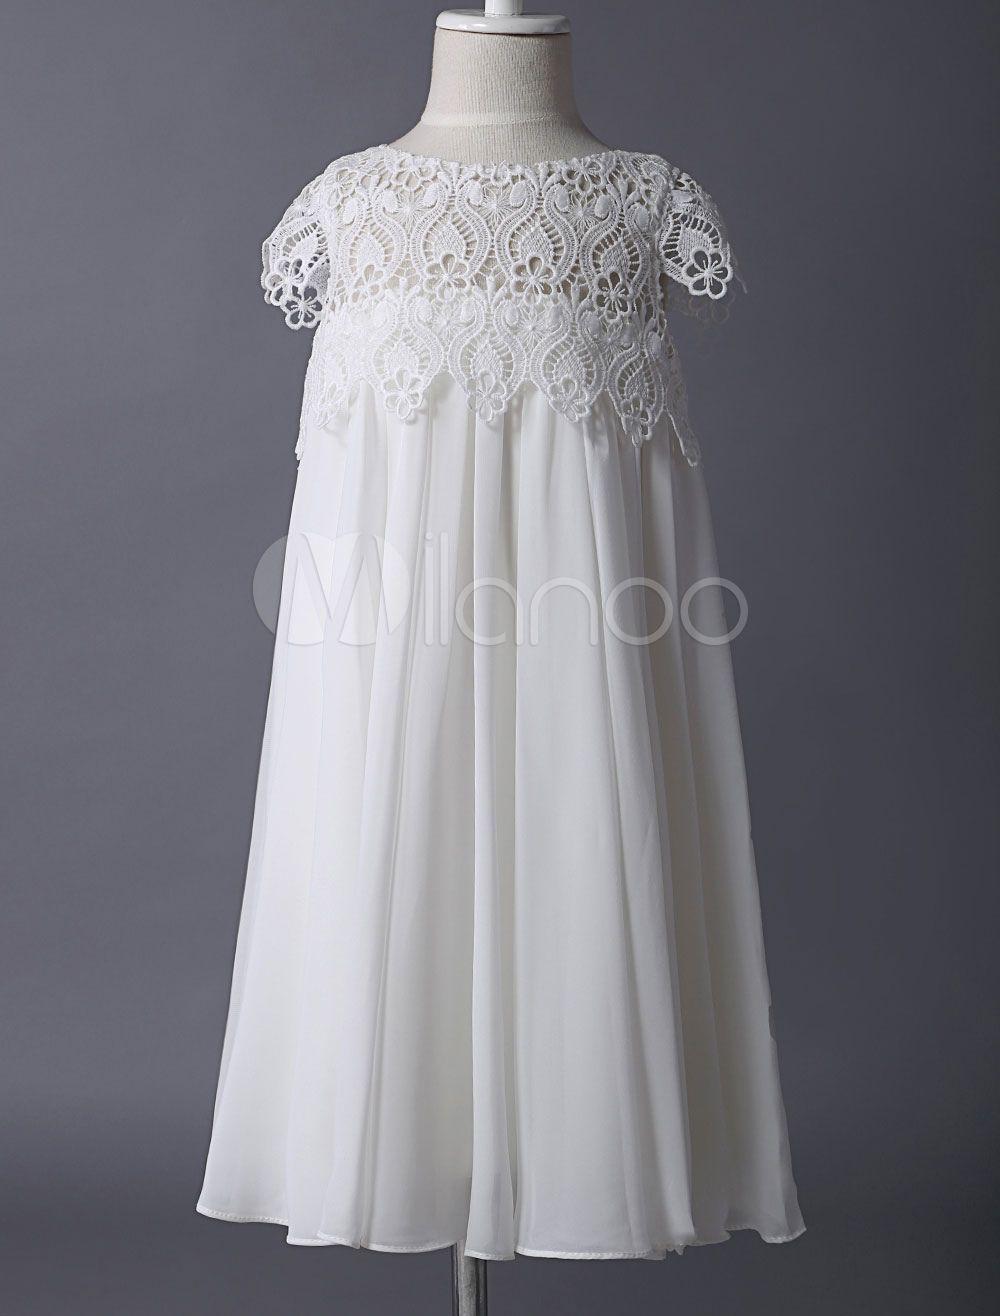 Boho Blumenmädchen Kleider Ivory Lace Cap Sleeves Chiffon kurze ...